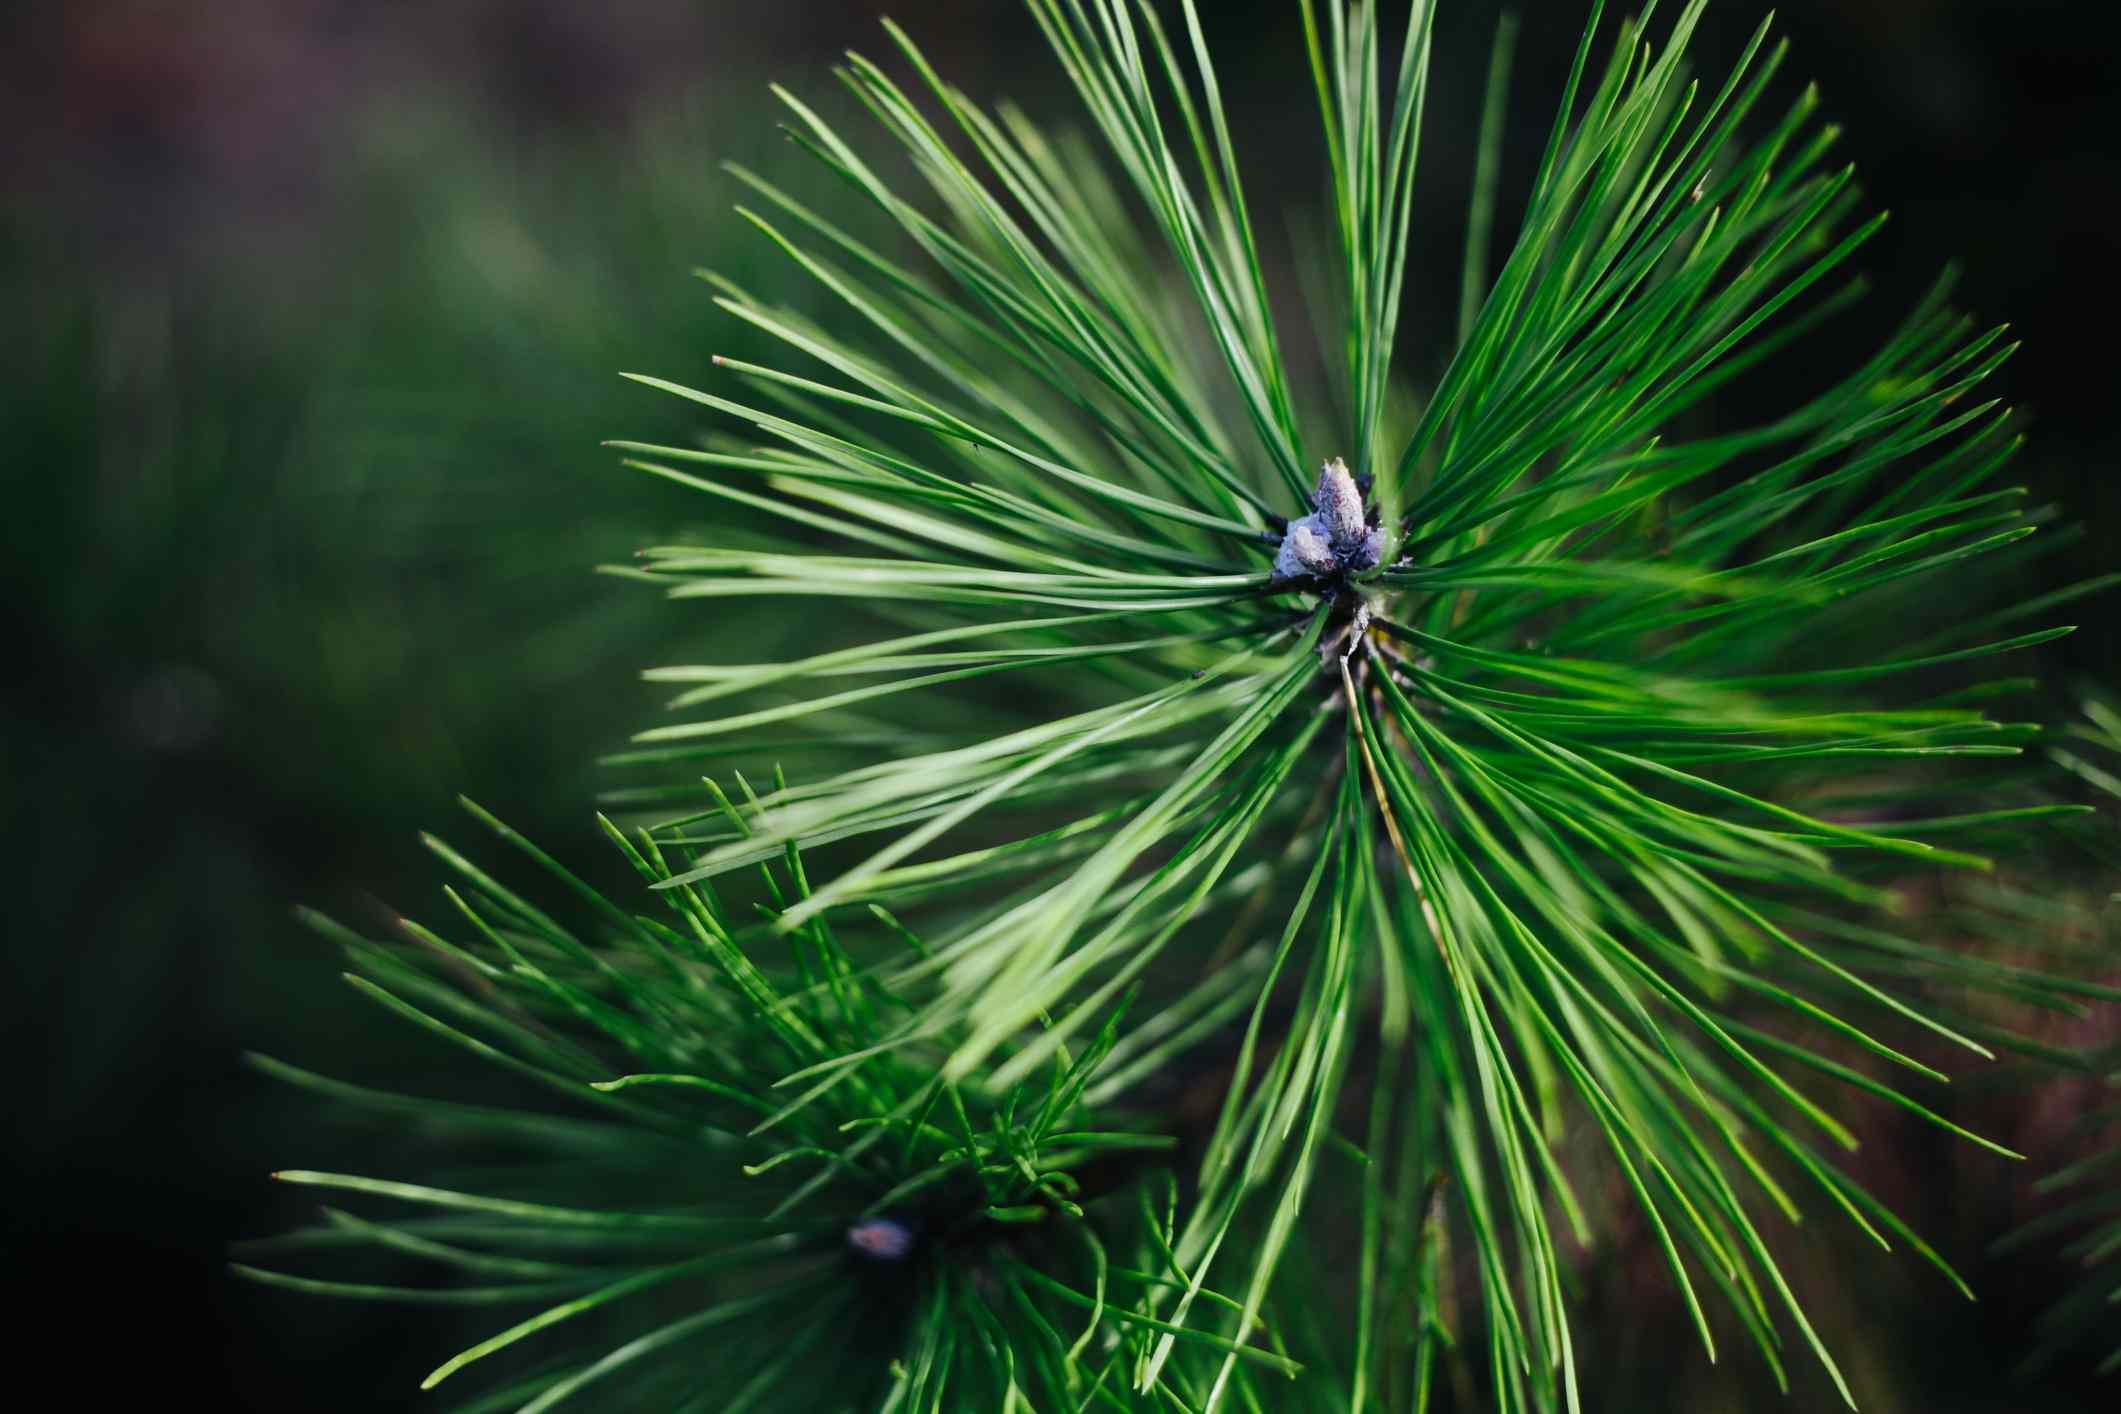 Detailed shot of green Pine needles.